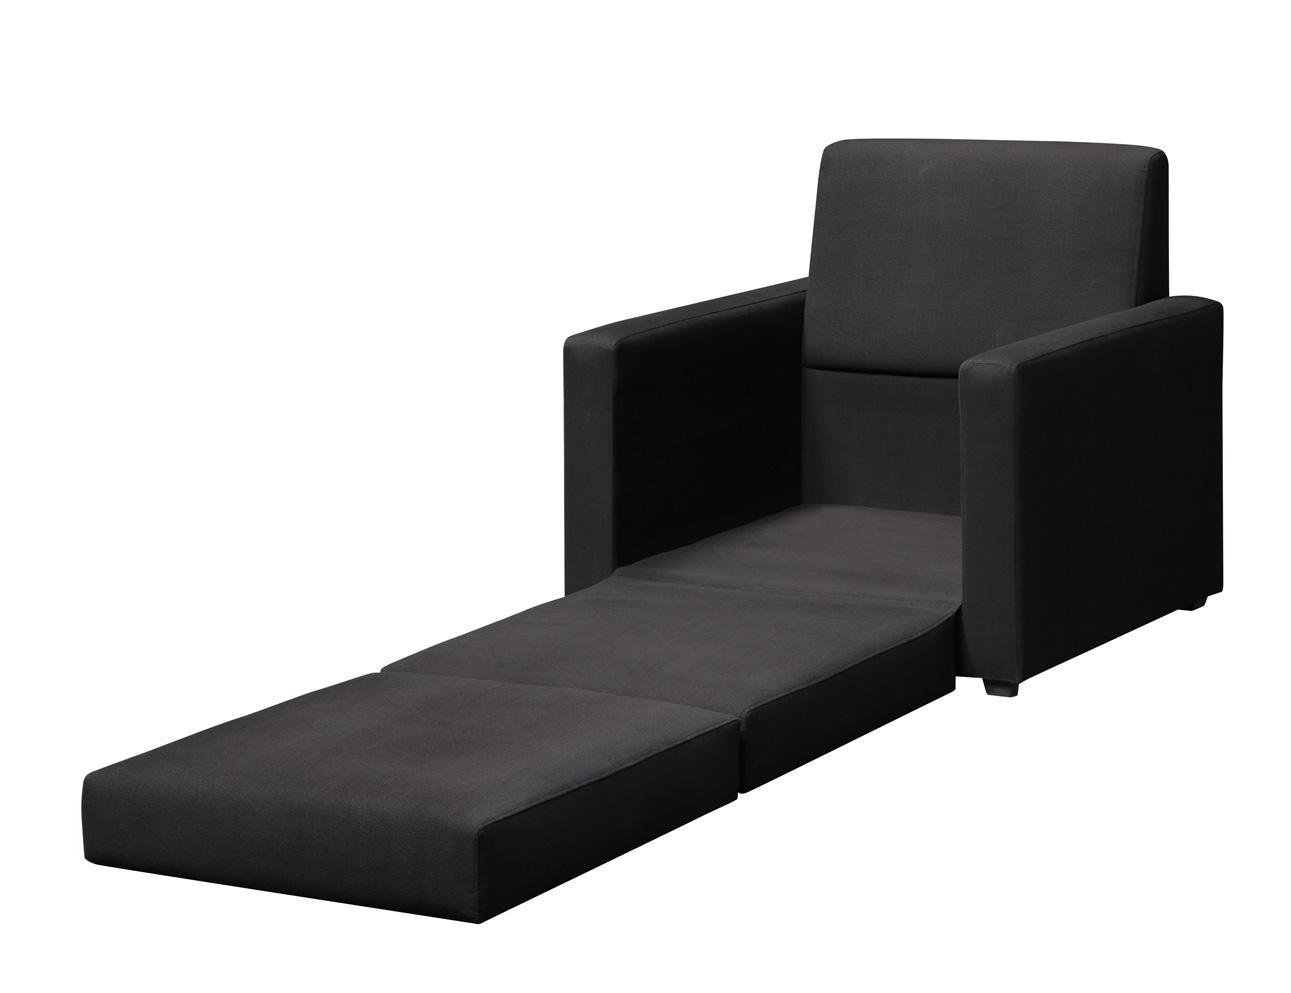 Superieur Stylish And Cool Single Sleeper Chair Idea